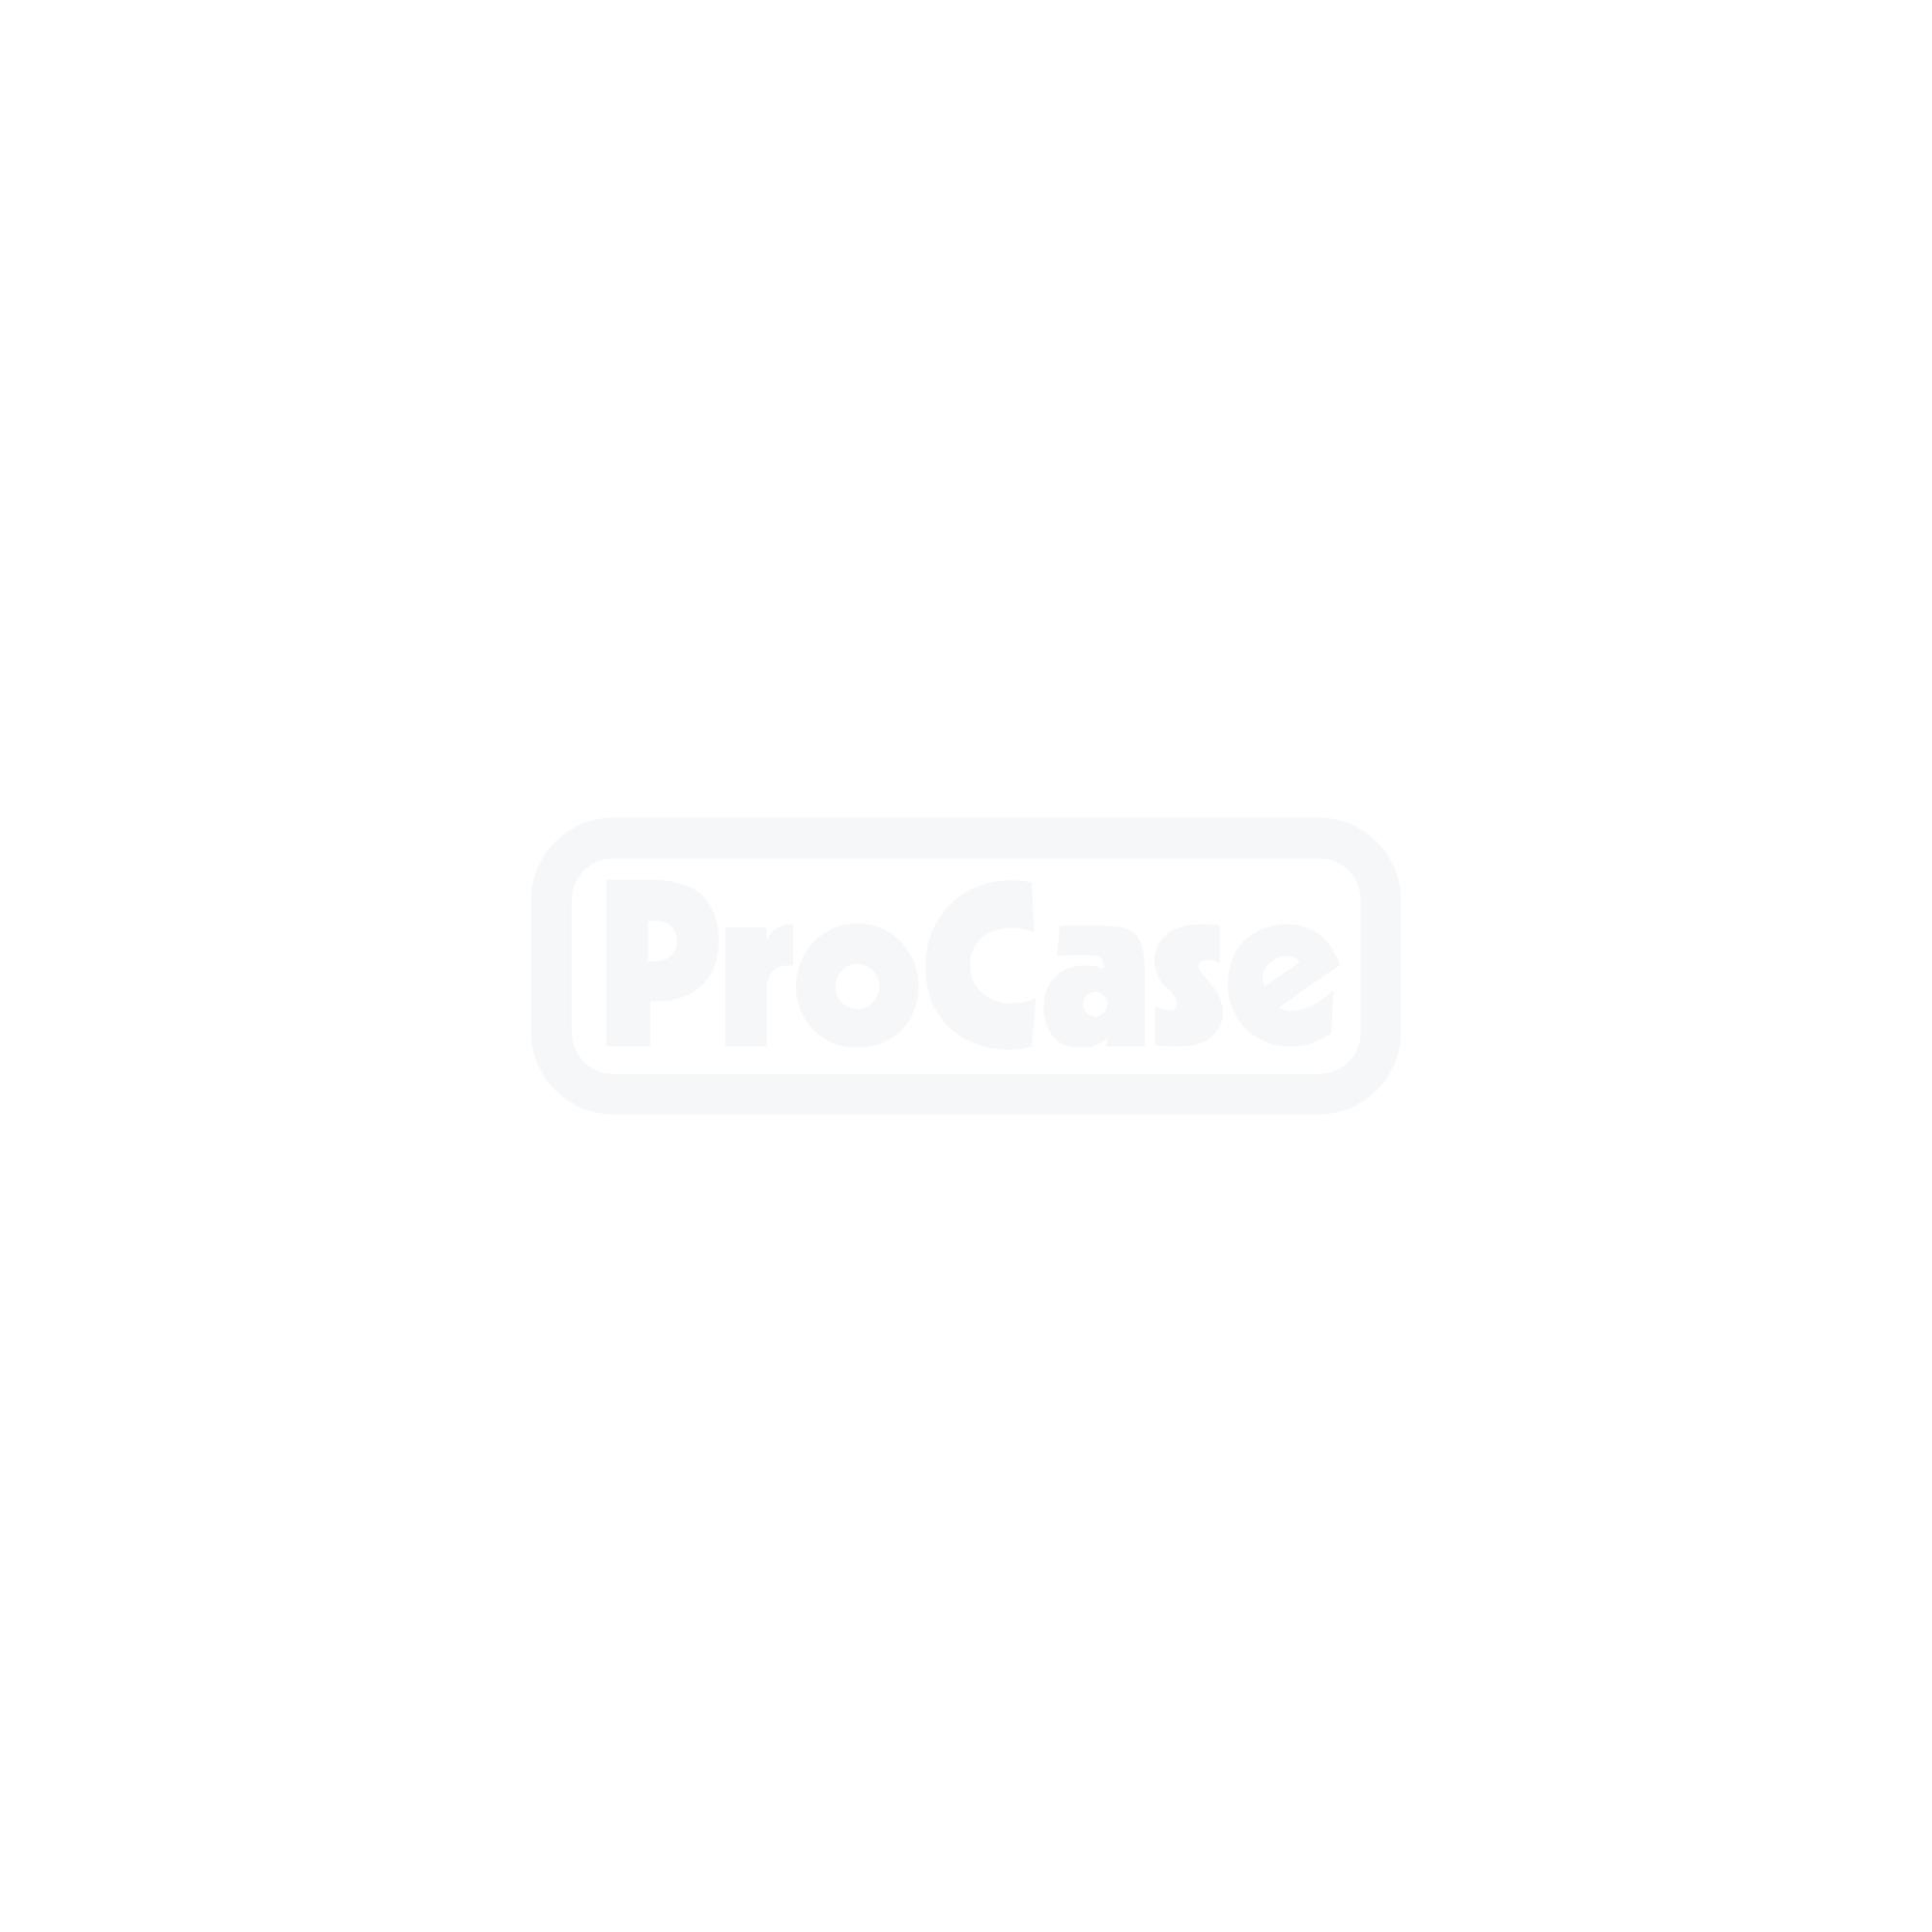 SKB 3R Koffer leer mit Trolley 2